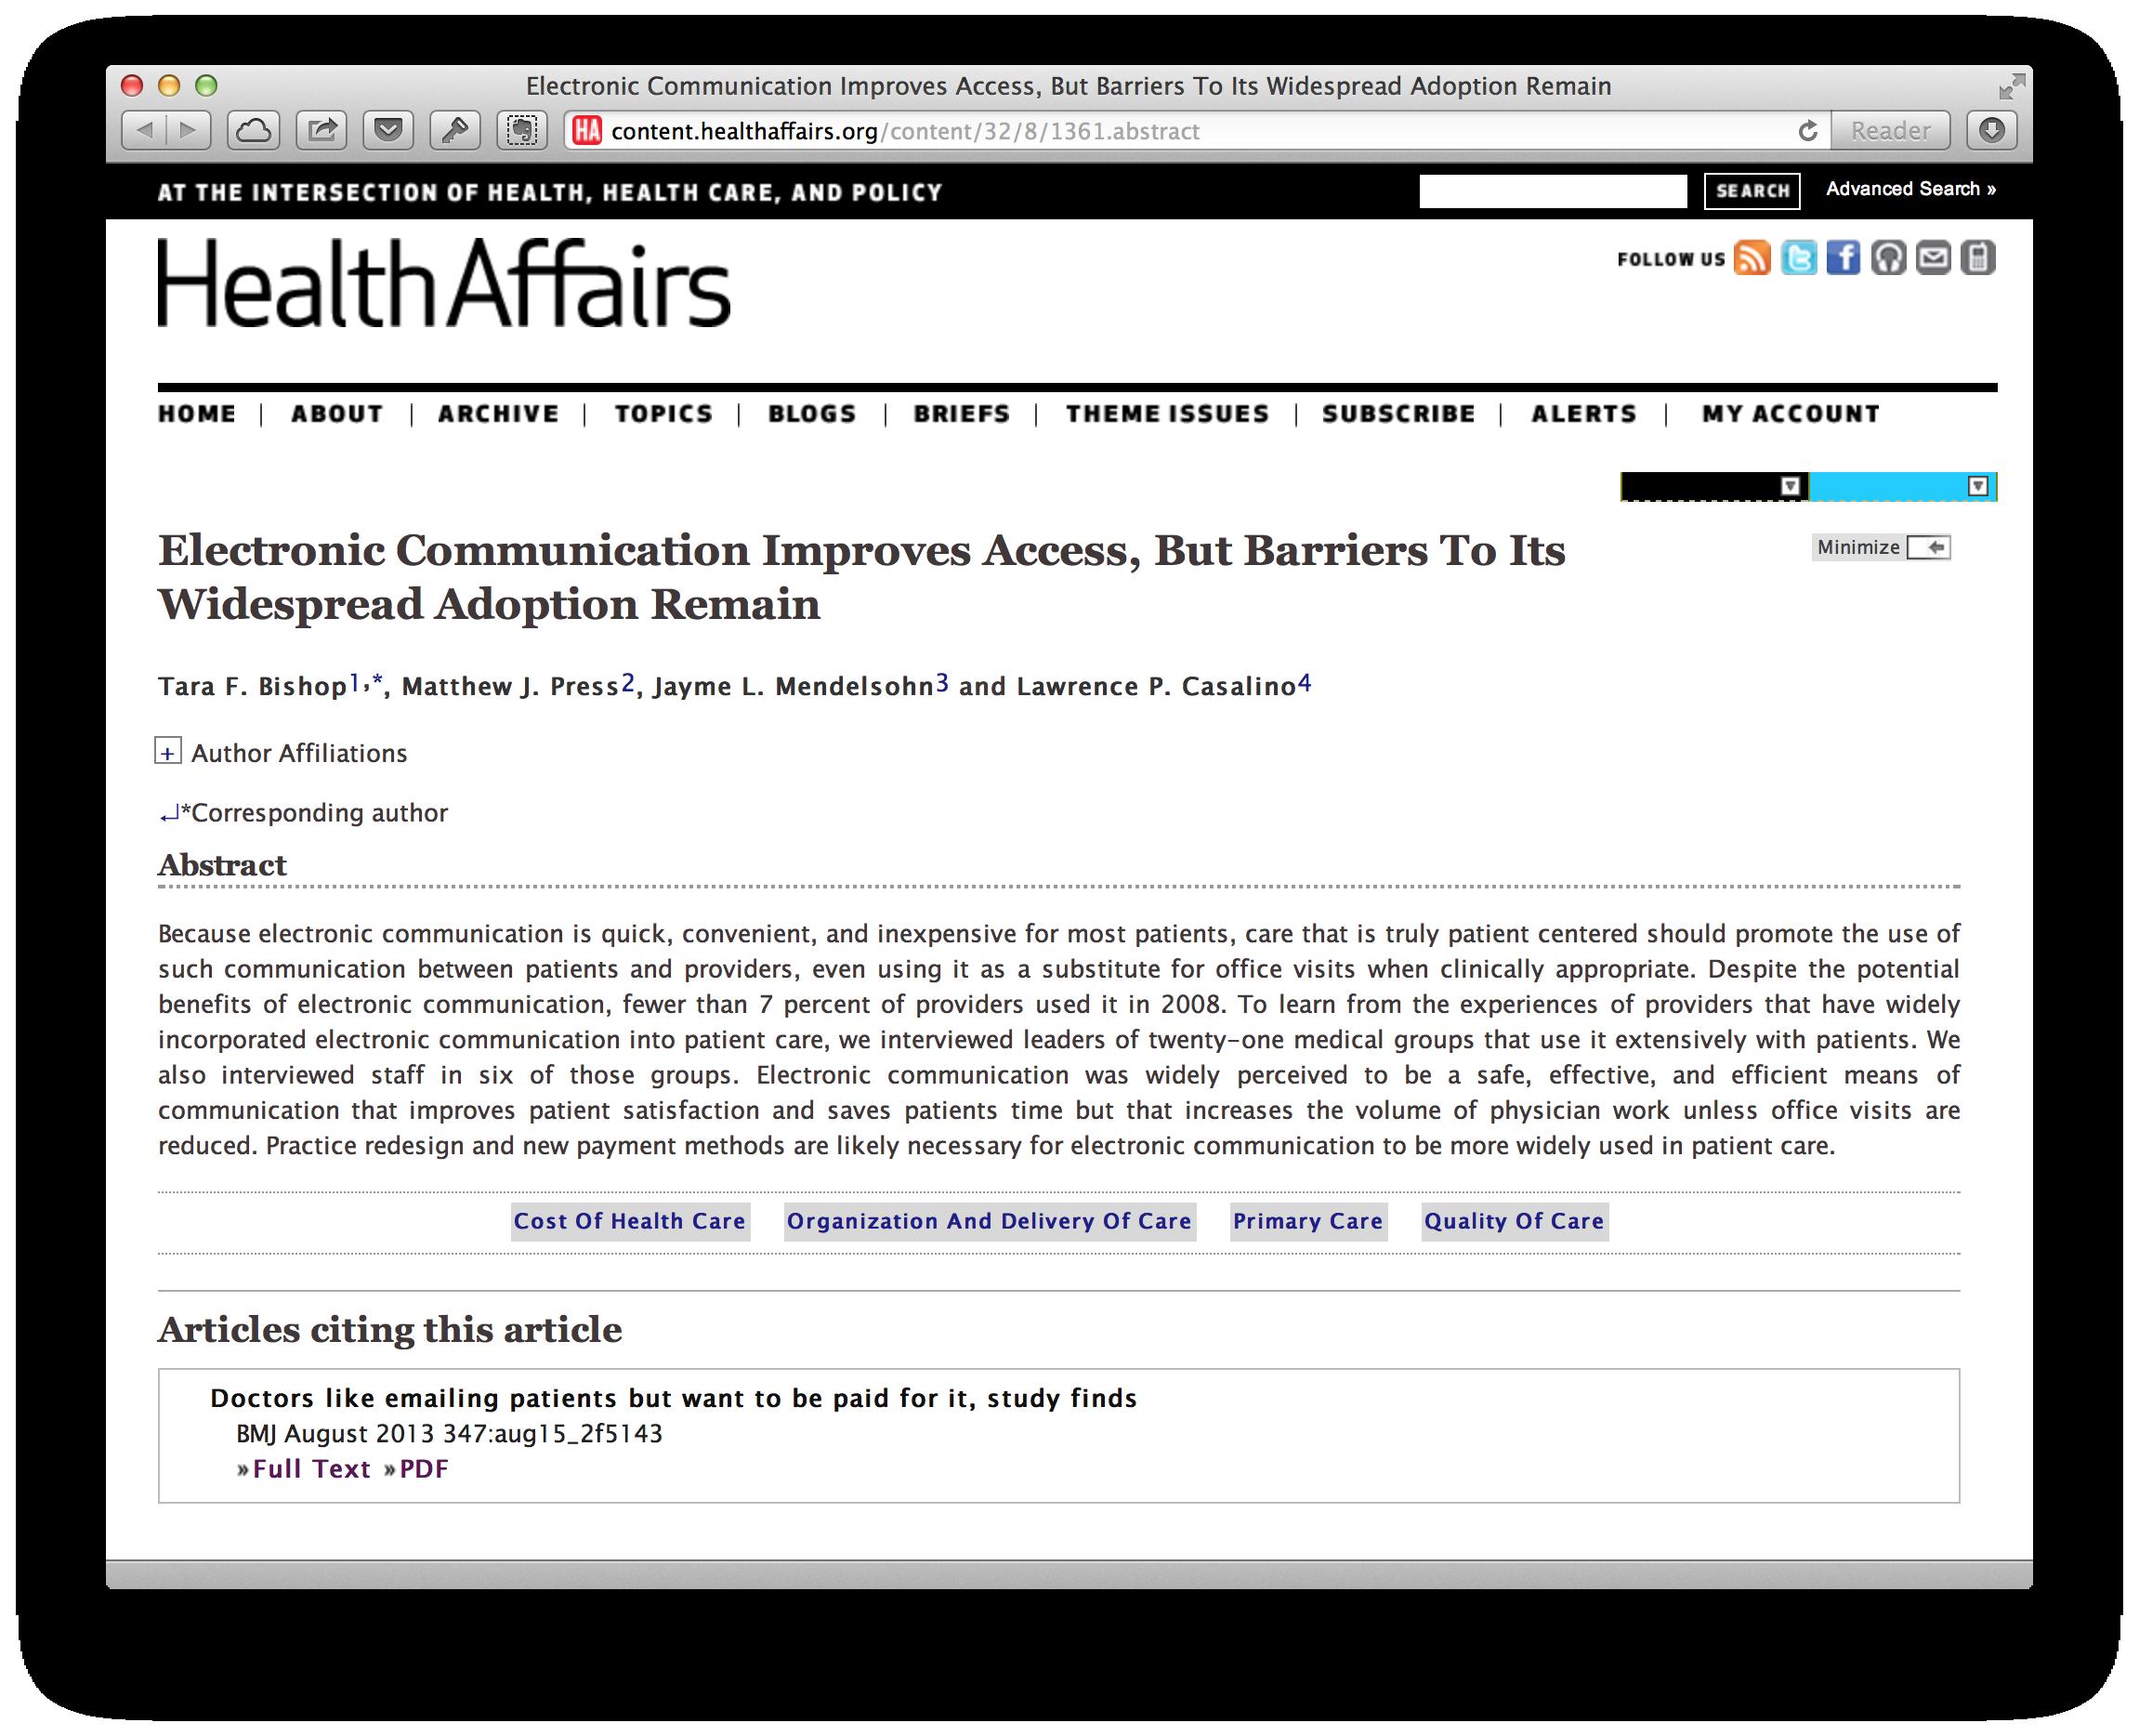 2013-0918-Health Affairs screenshot.png